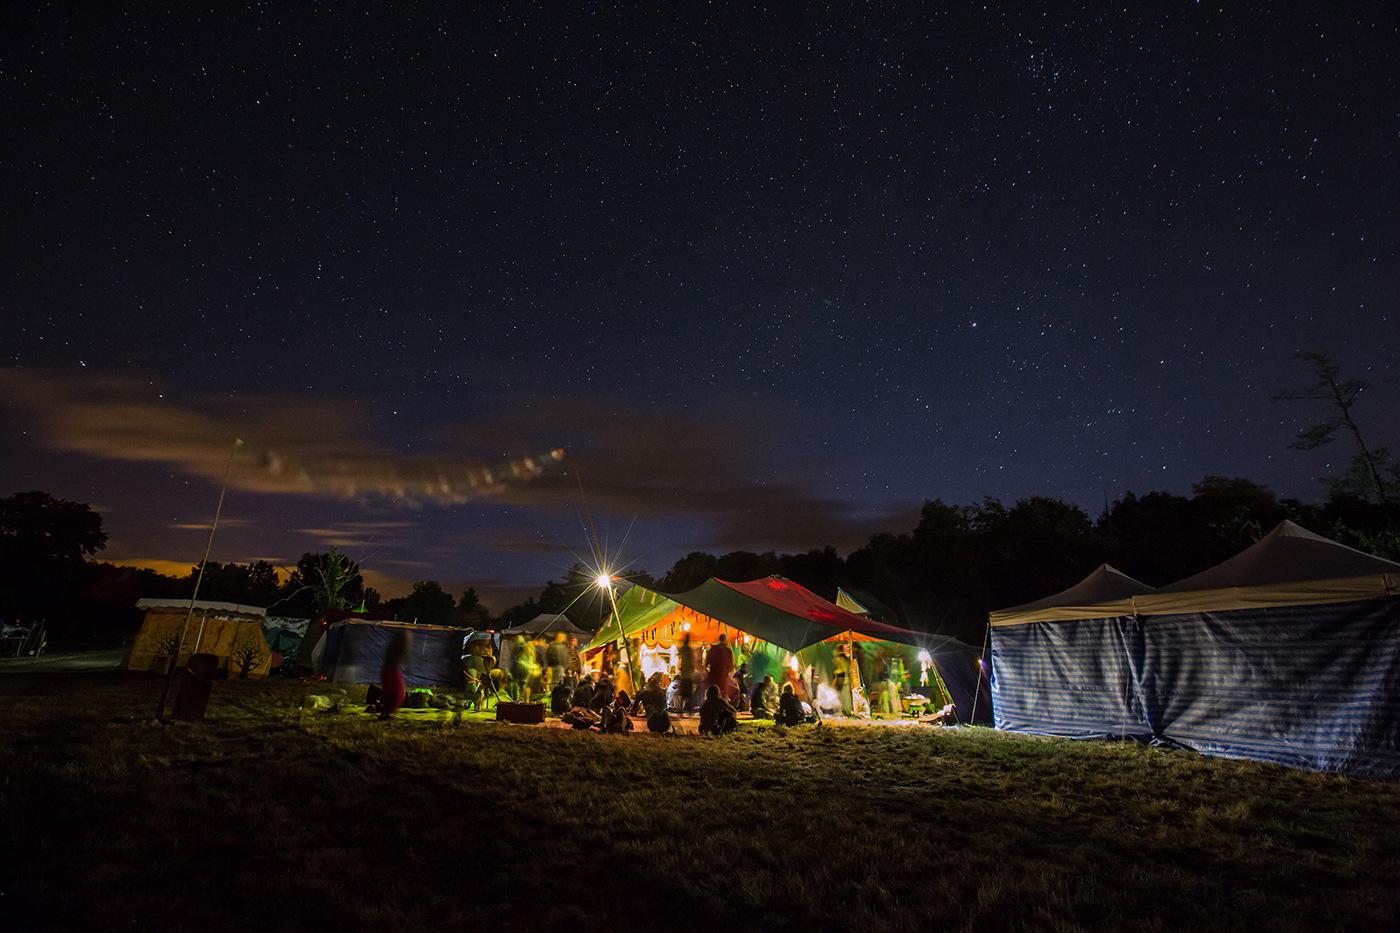 Tente berbère nuit